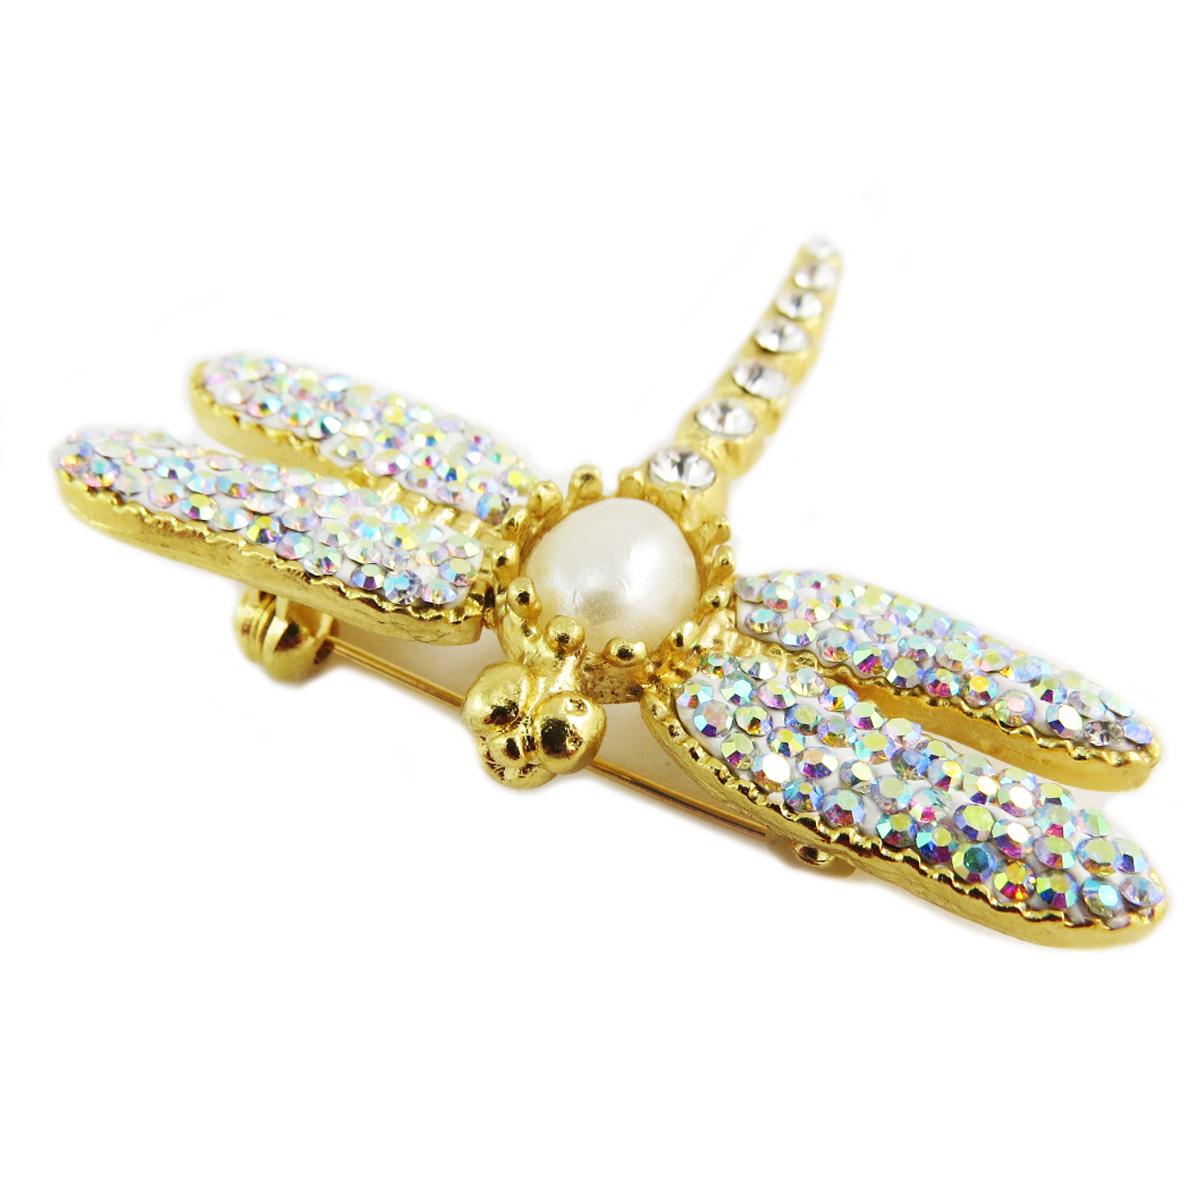 Broche artisanale \'Cléopatra\' blanc doré (libellule) - 50x48 mm - [Q5658]